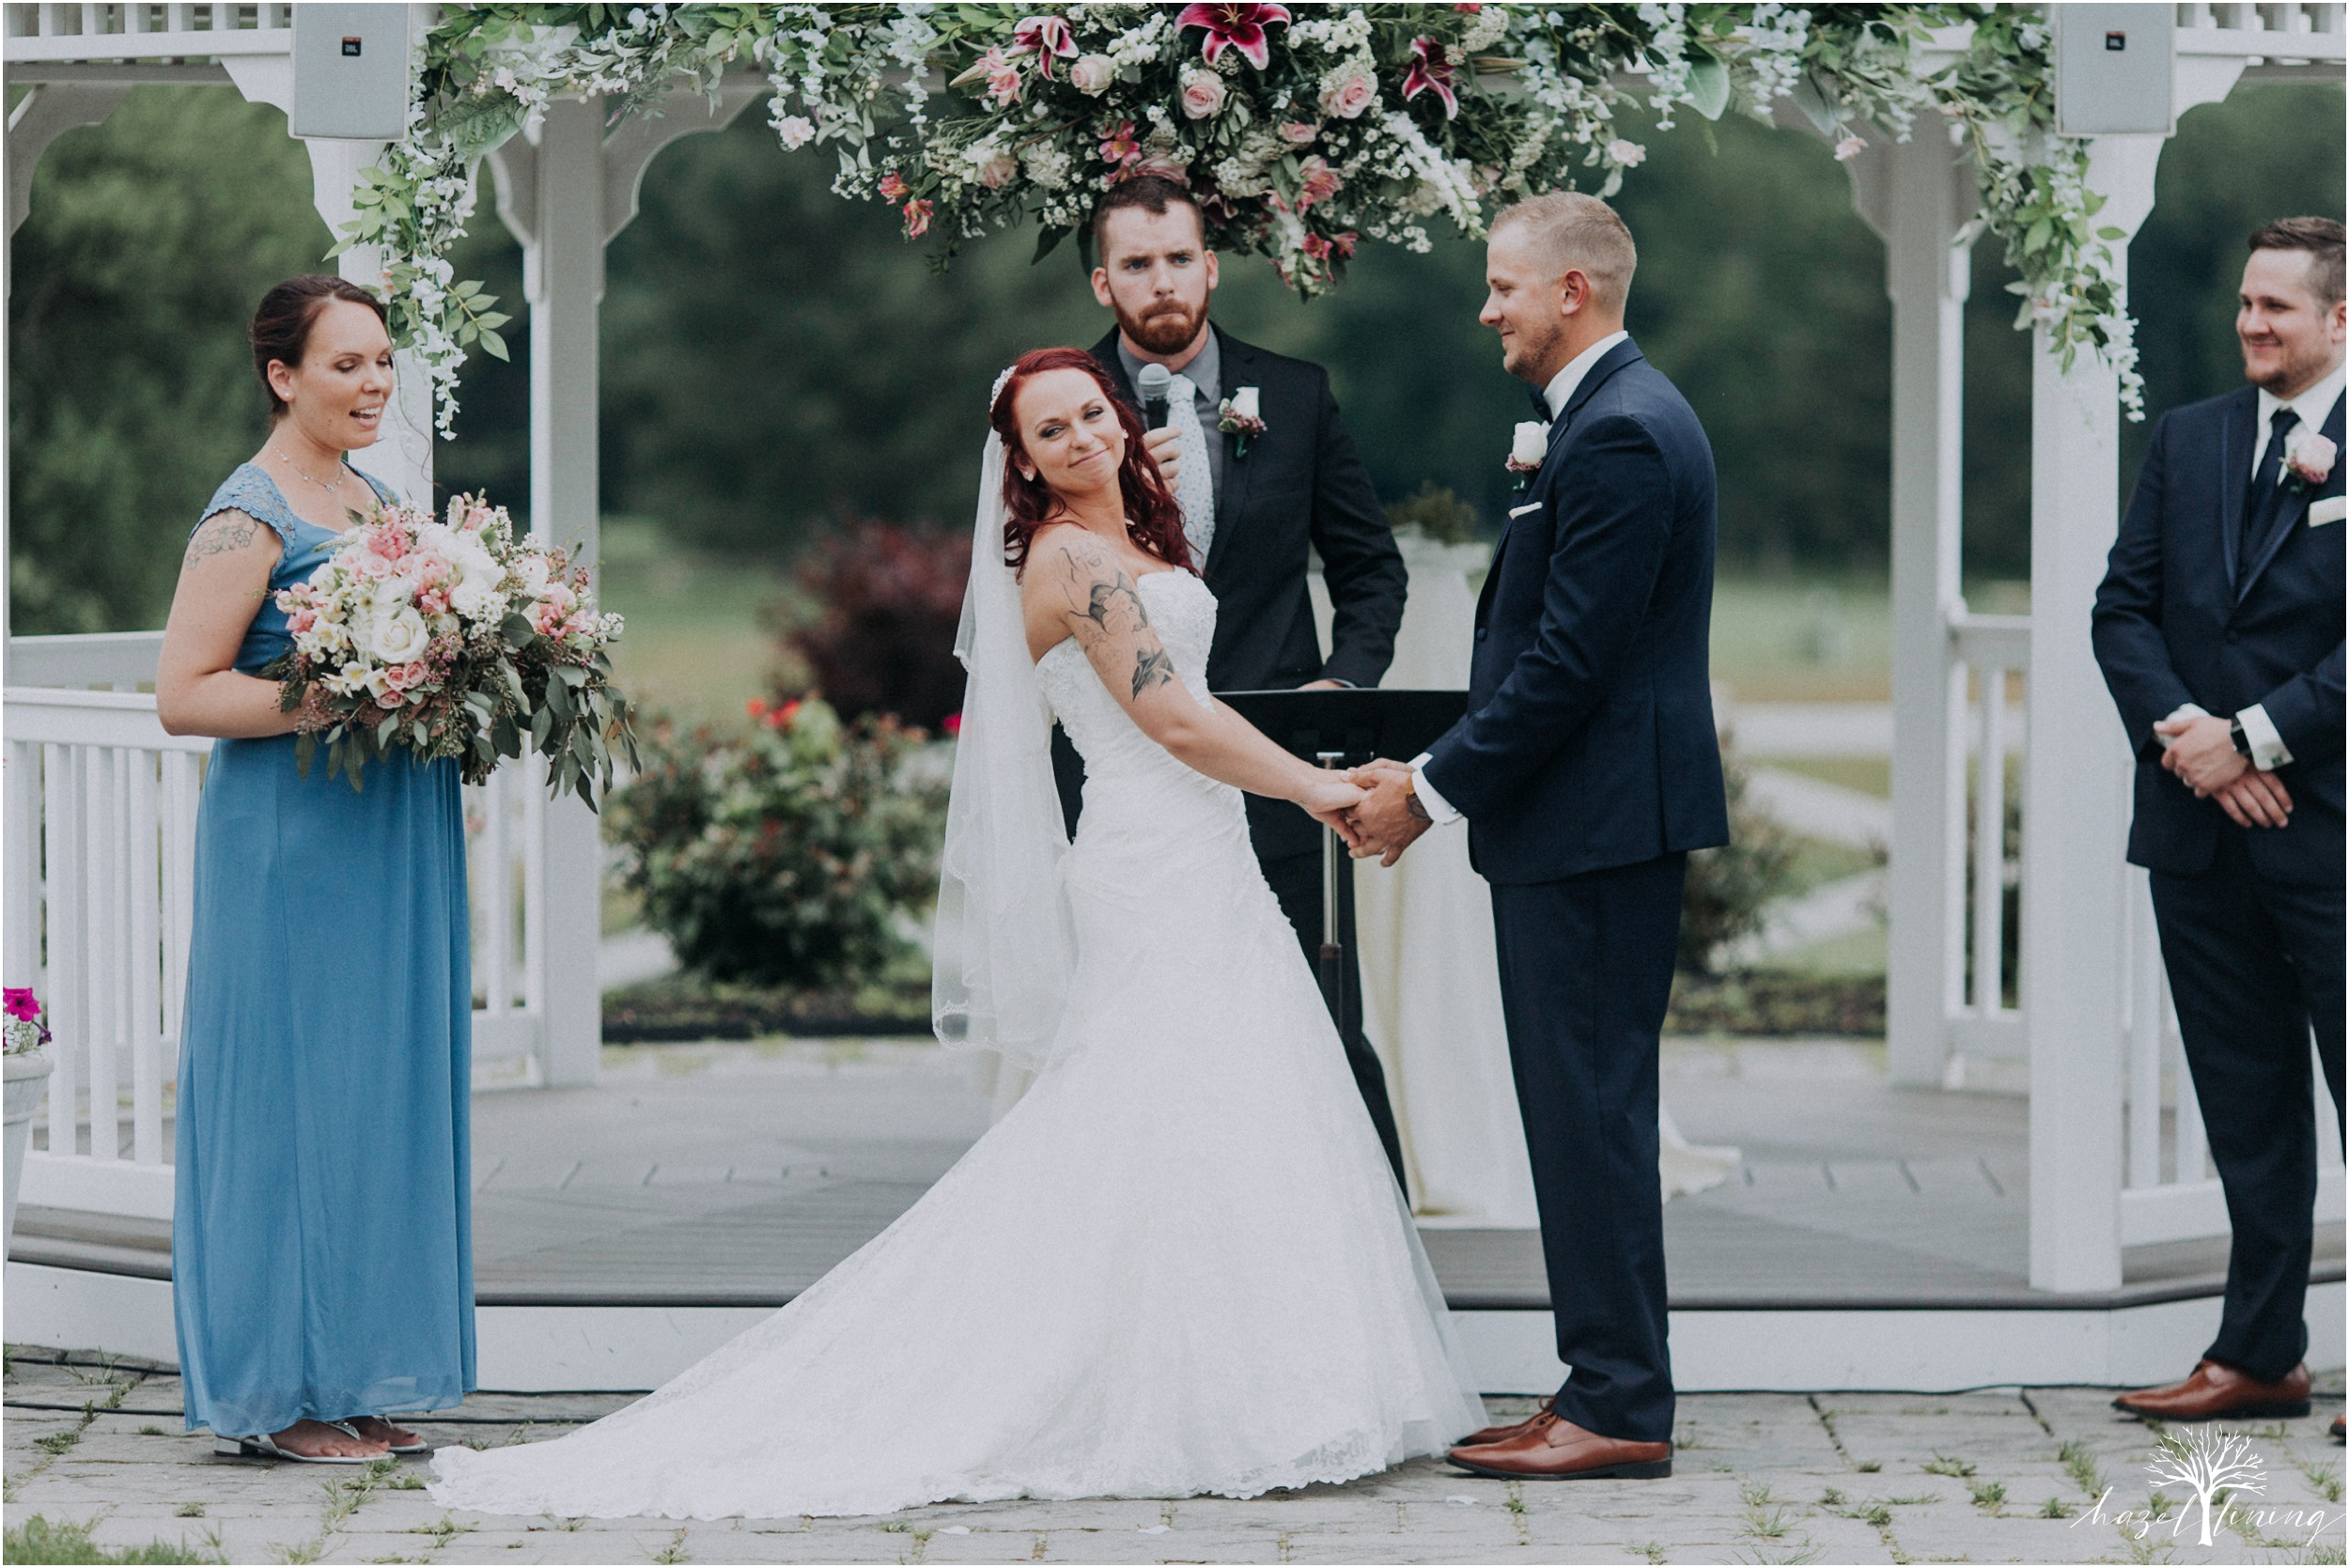 alyssa-james-stiteler-wedding-loft-and-sweet-water-cc-pennsburg-pennsylvania-hazel-lining-travel-wedding-elopement-photography_0053.jpg